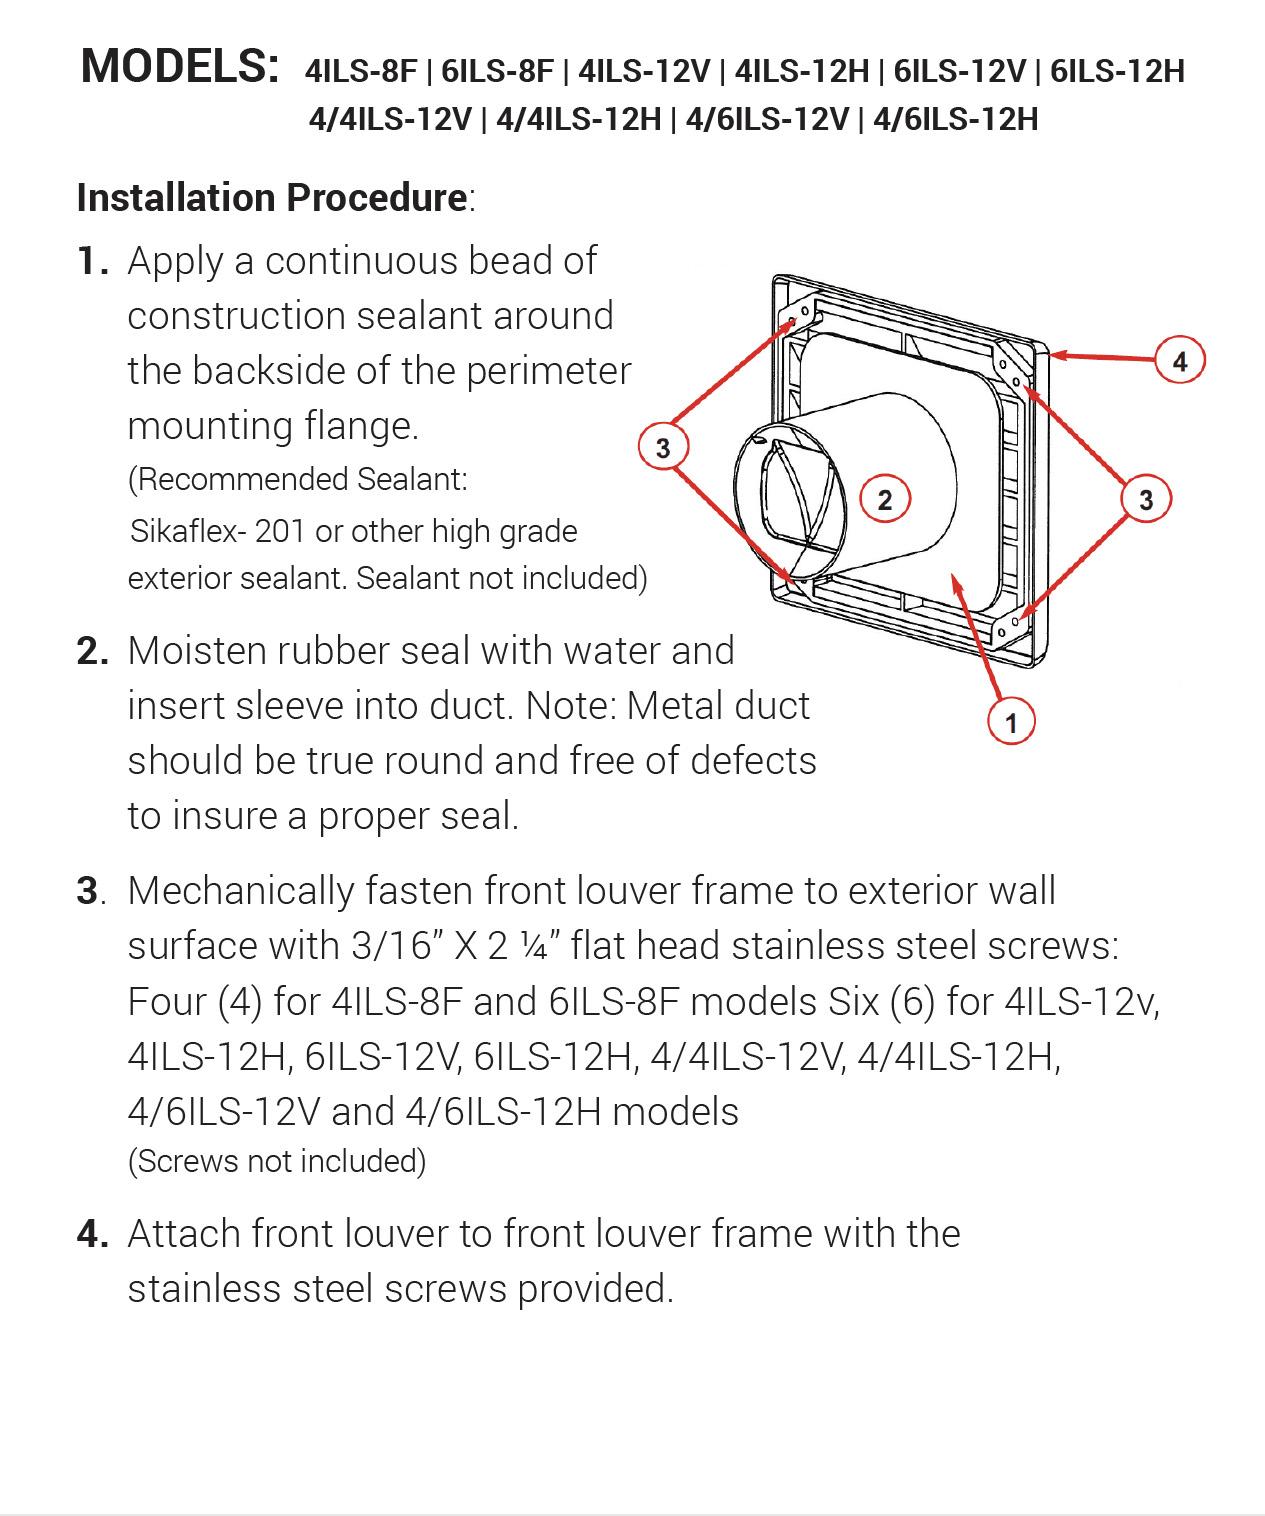 ILS Series Instructions